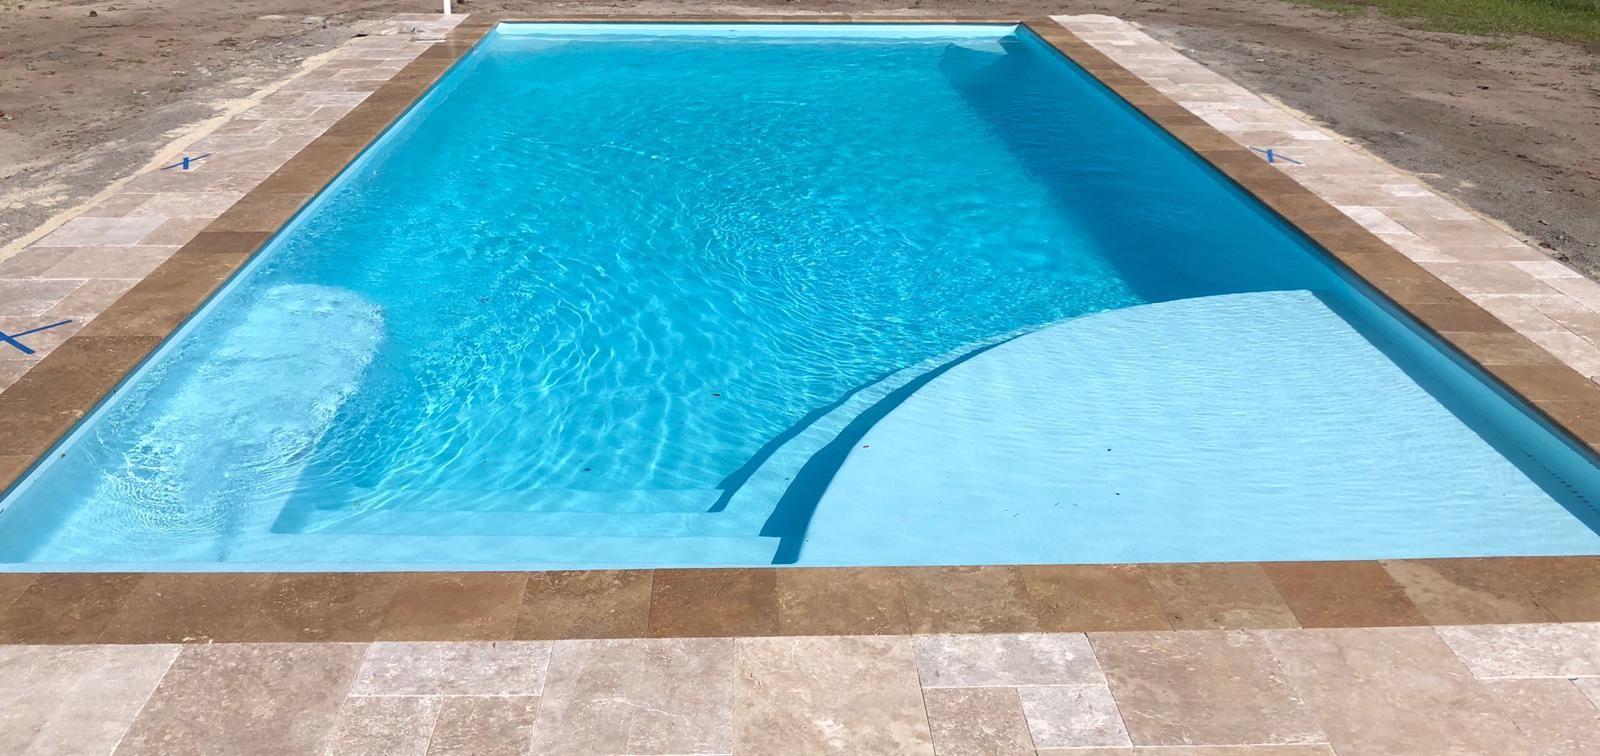 The Lake Superior San Juan Pools San Juan Pools Inground Fiberglass Pools Pool Photos